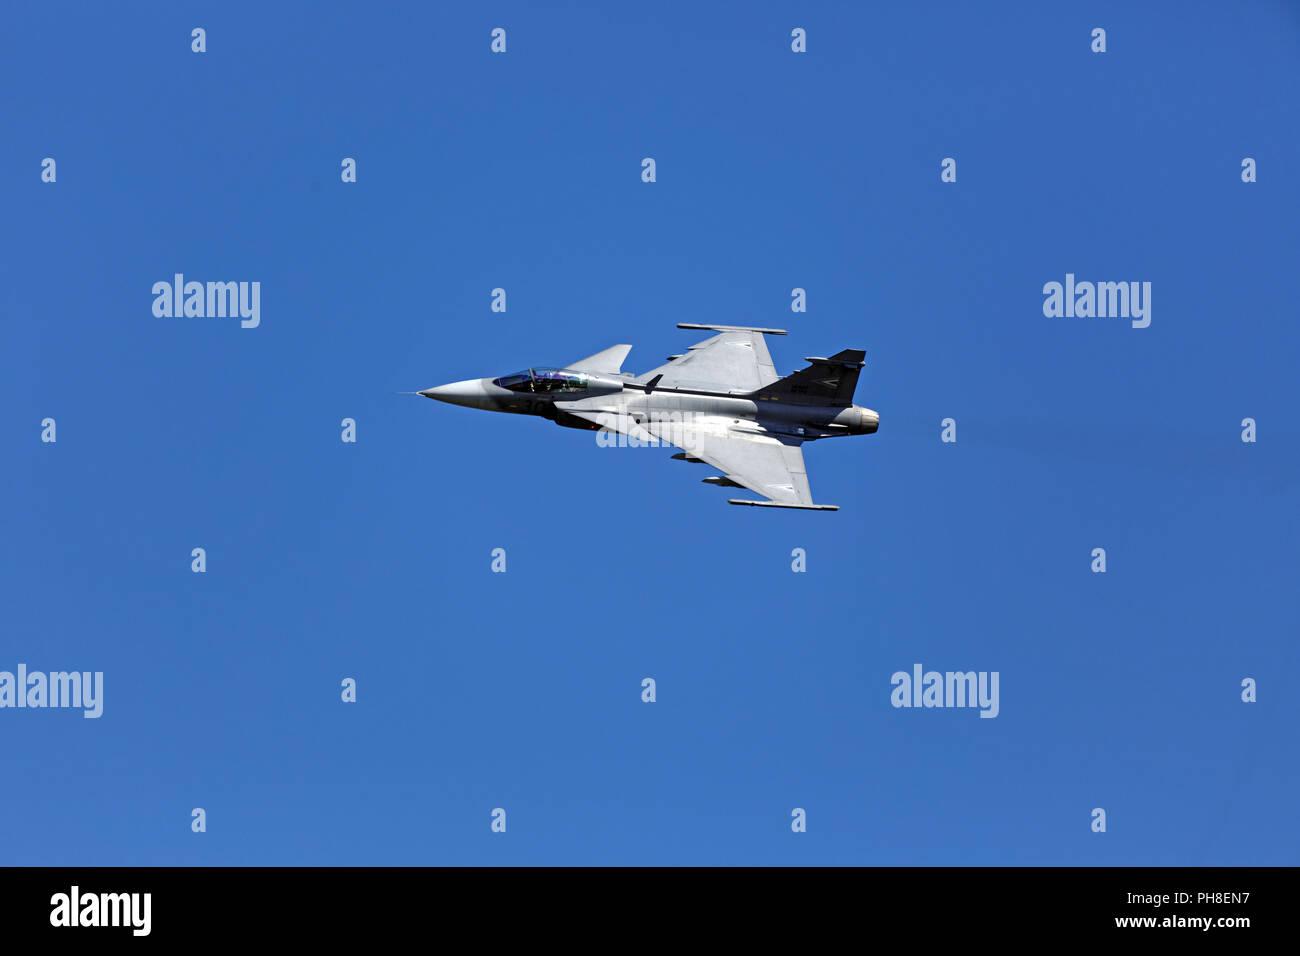 20. CIAF 2013: JAS39 Gripen Stock Photo